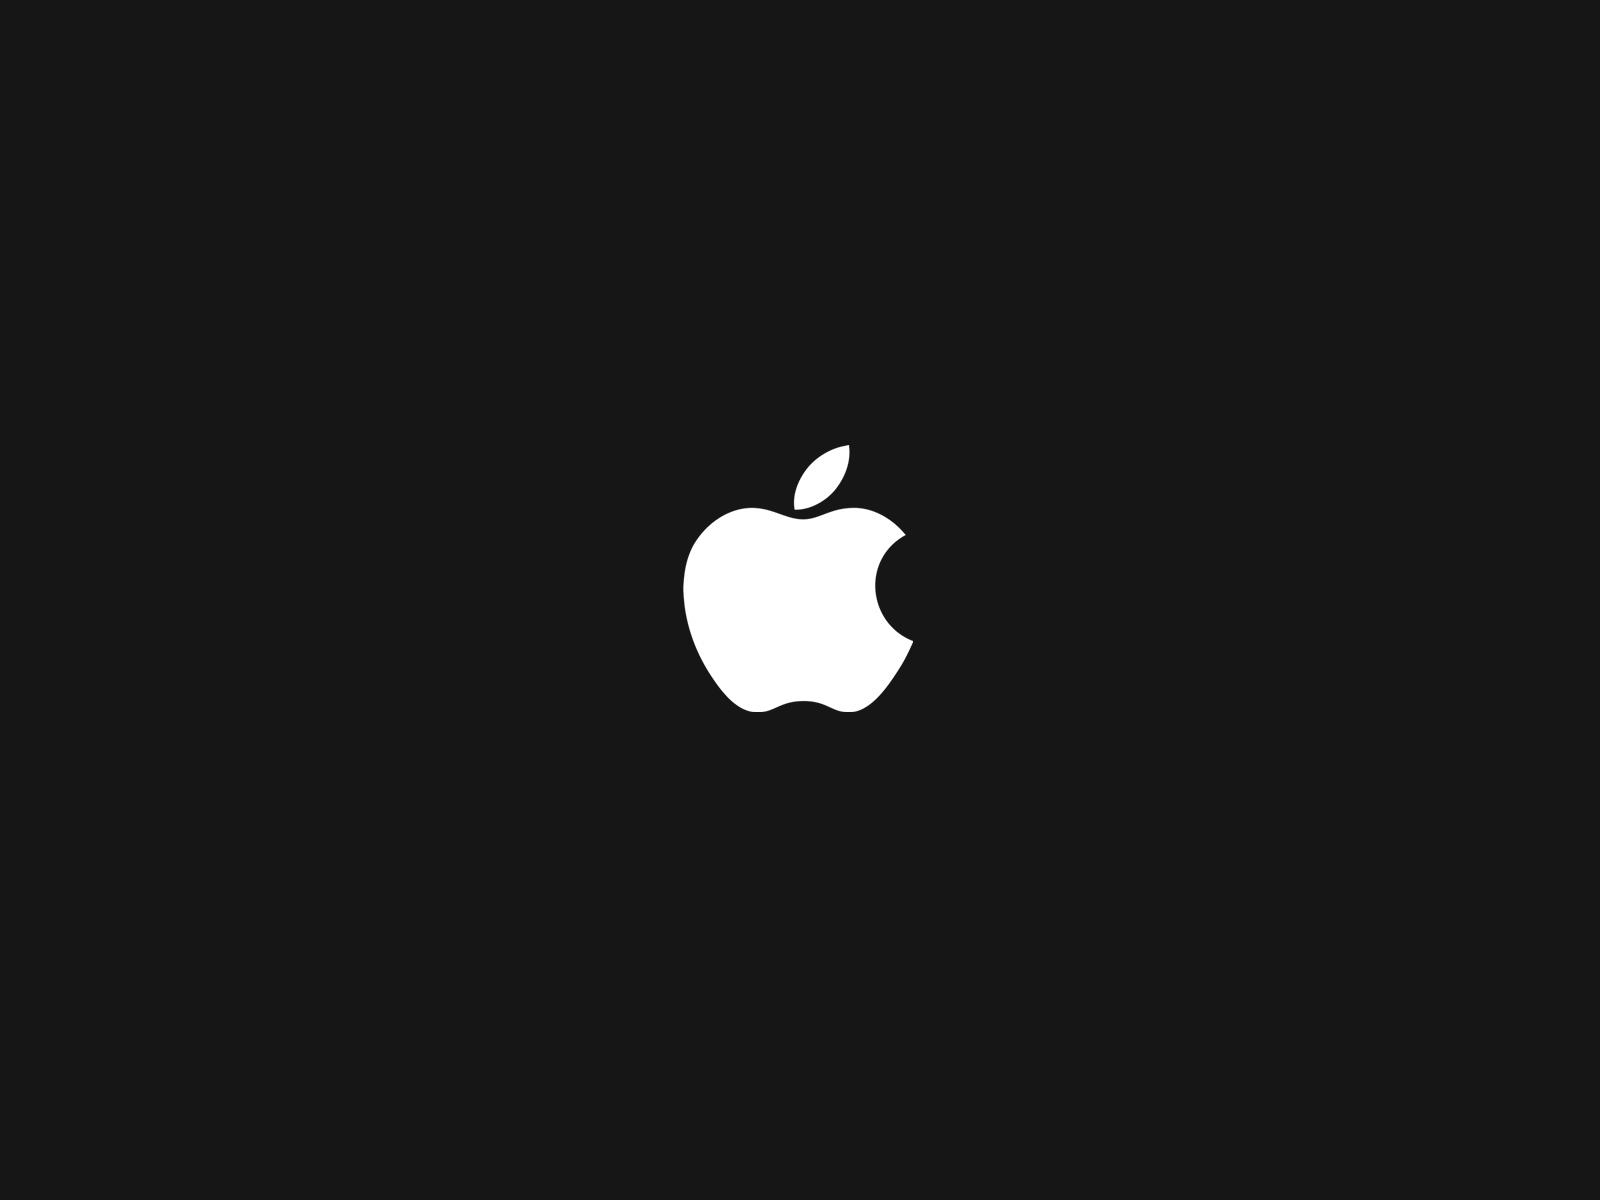 ... Apple Logo Wallpaper ...